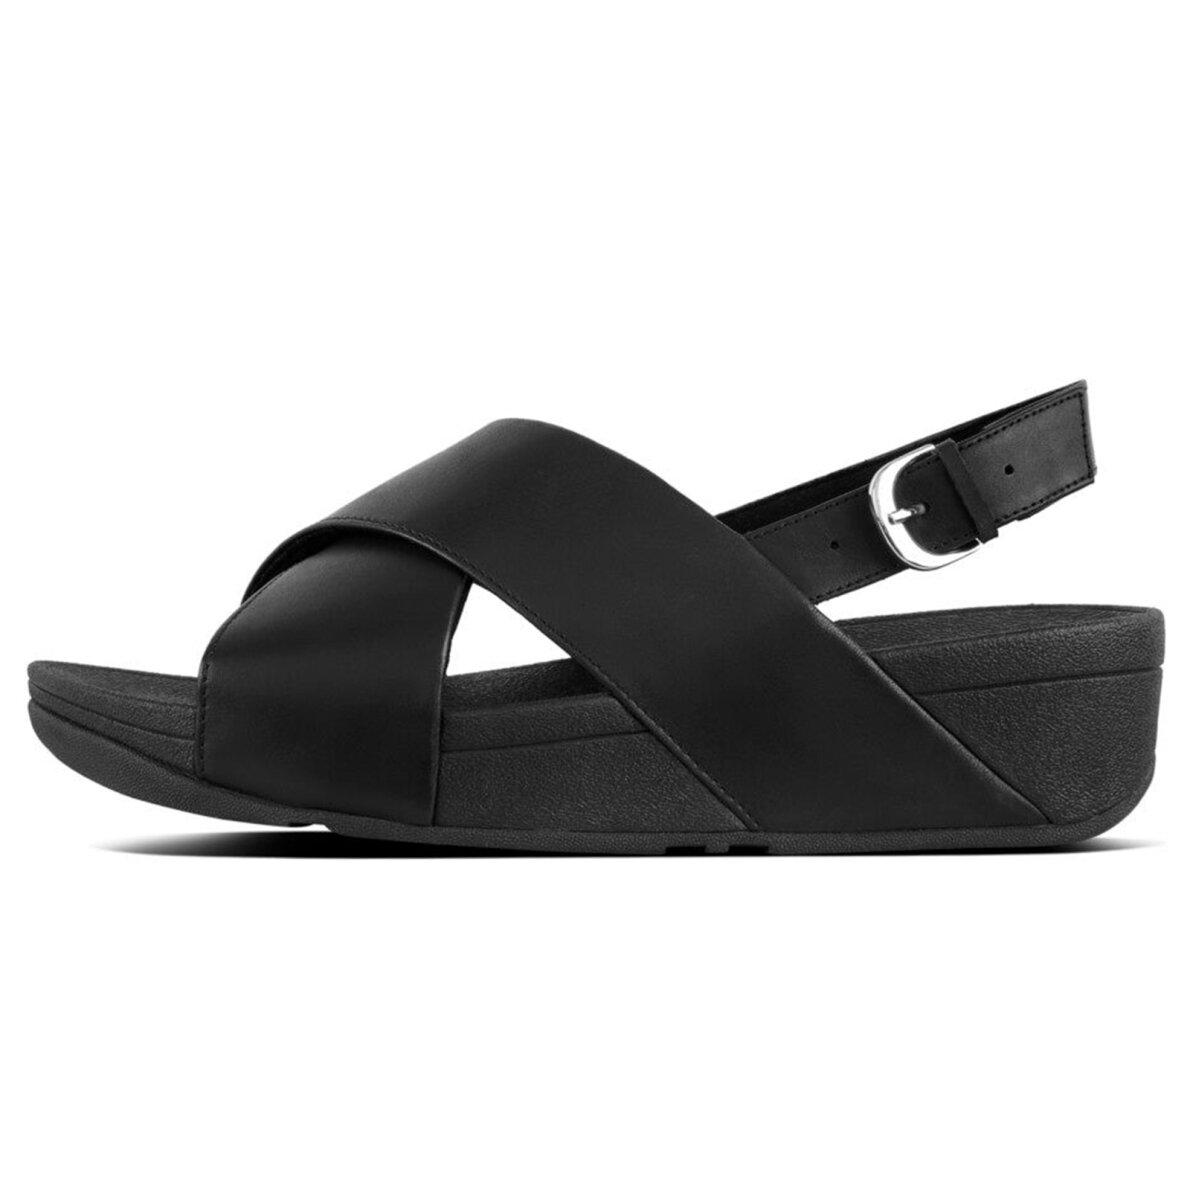 PIEDI Fitflop Lulu Cross Sort dame sandal med rem Piedi.dk